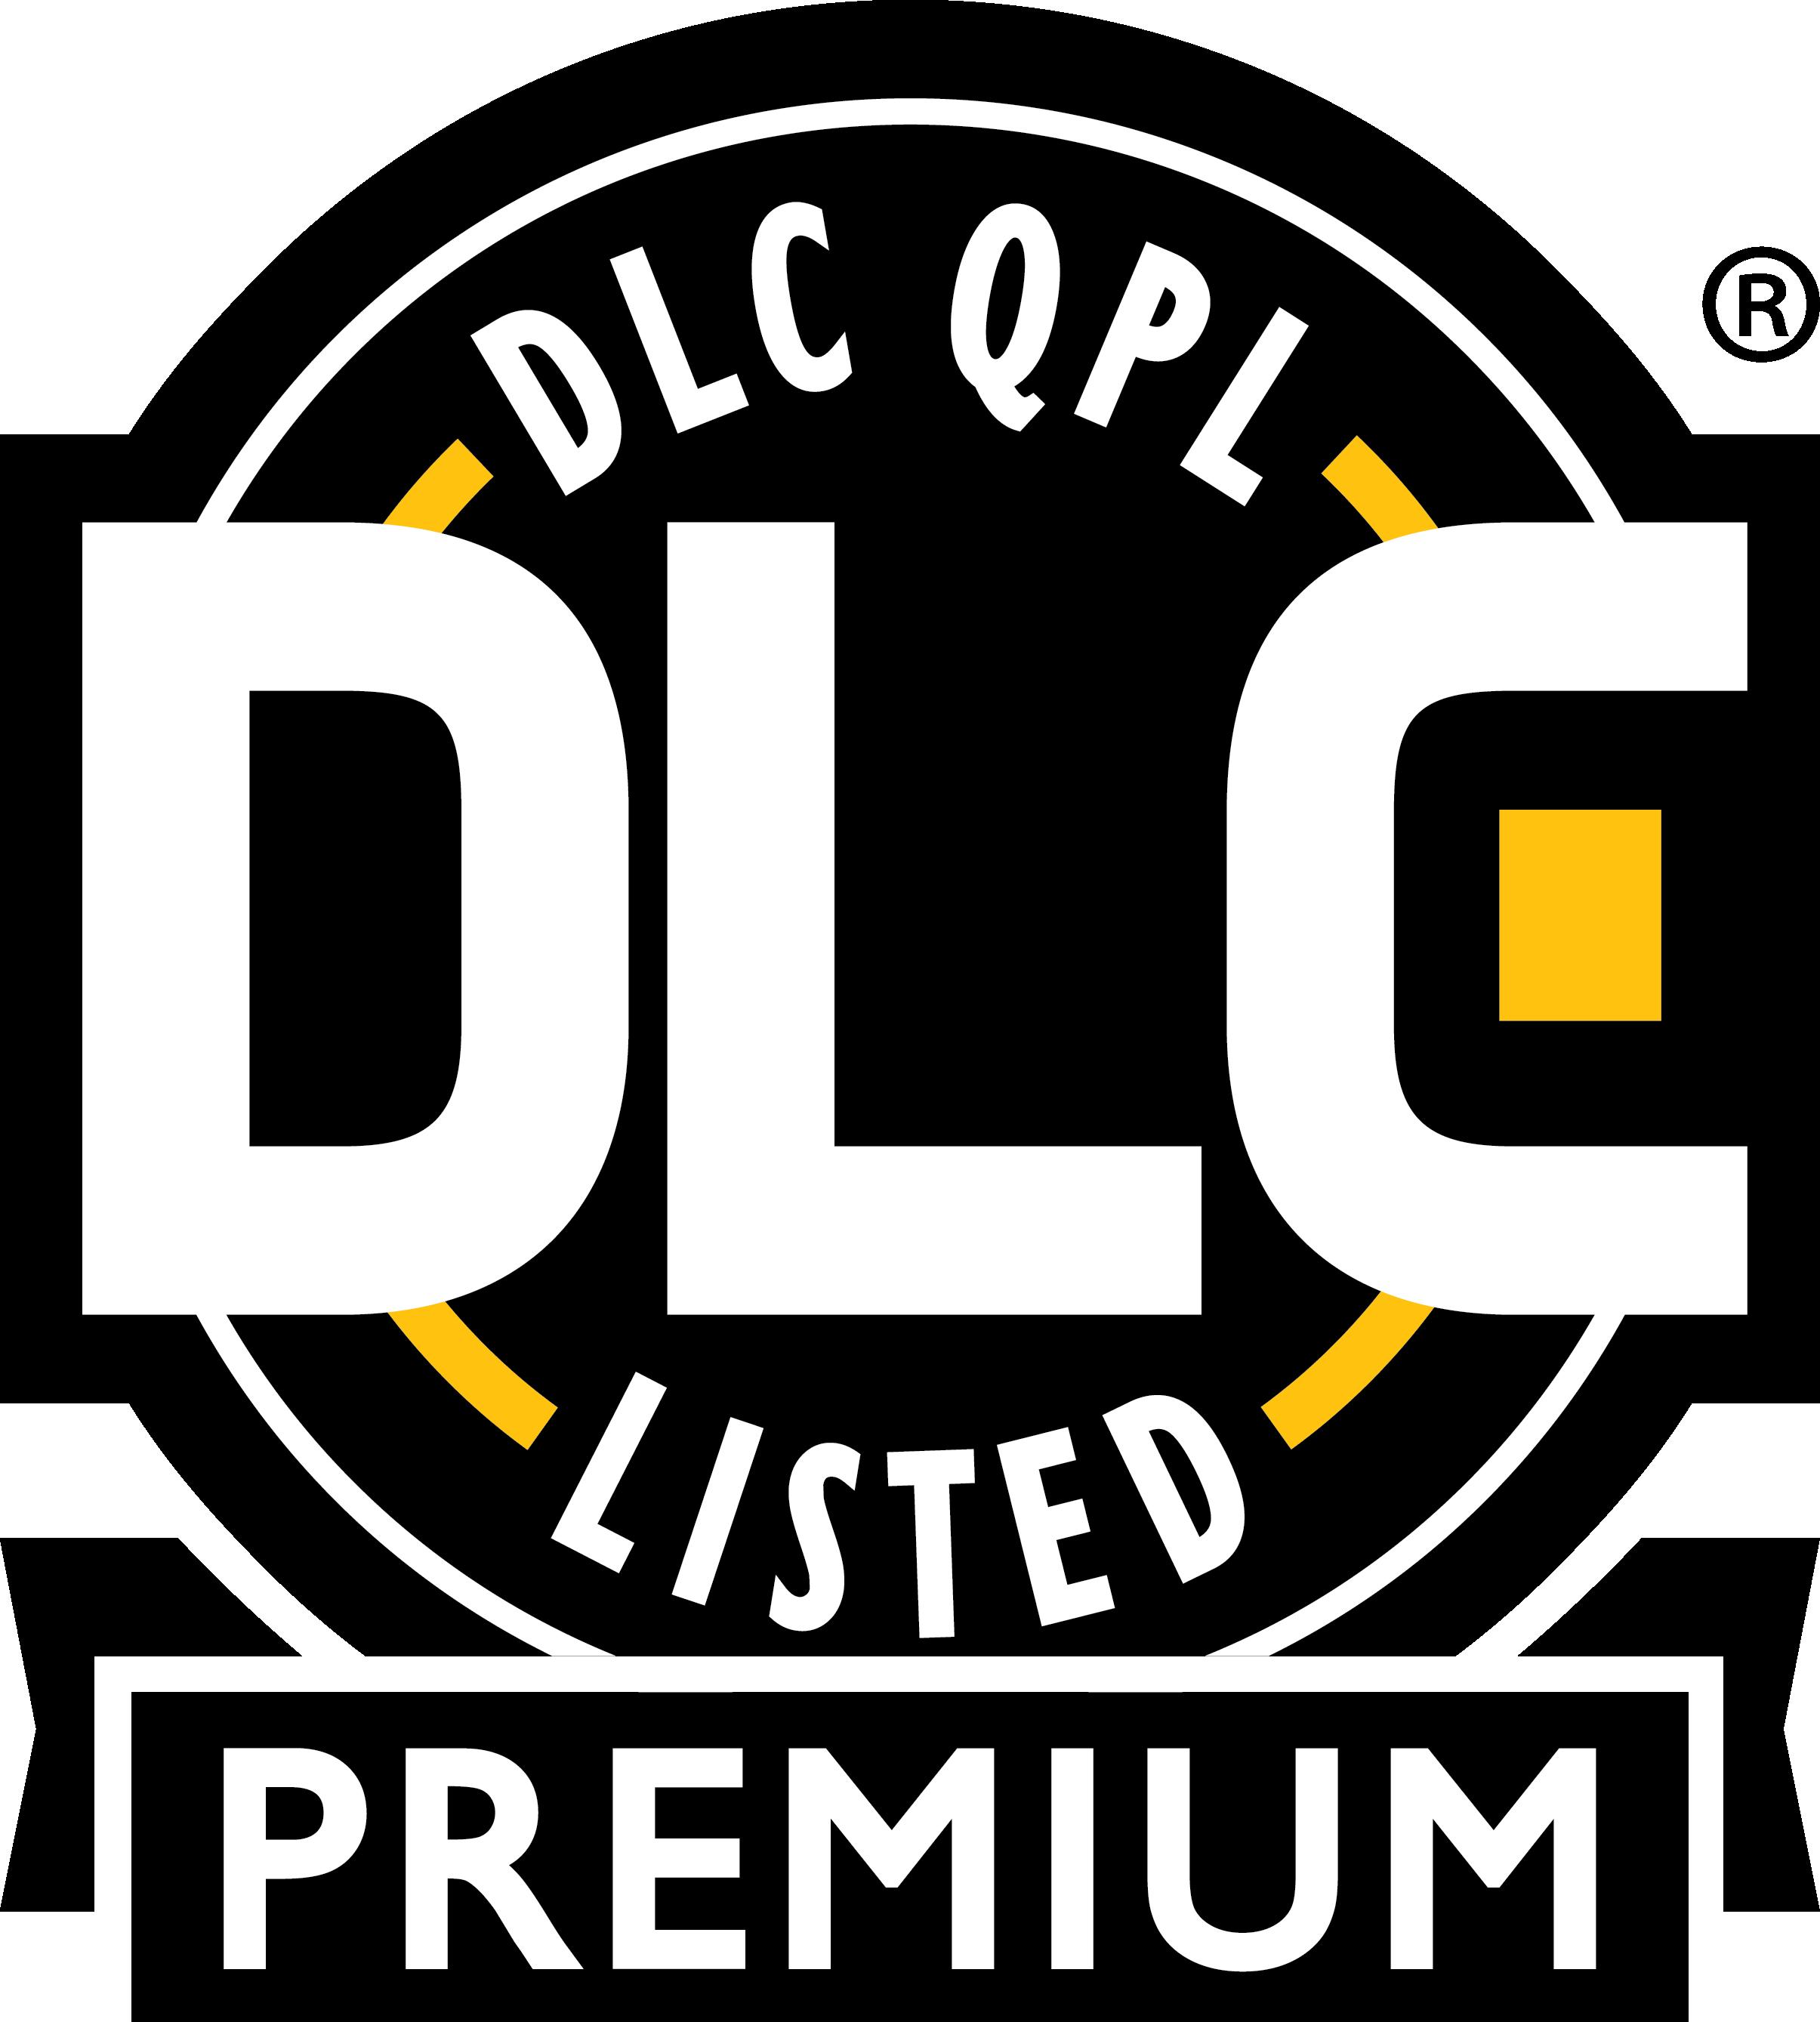 Dlc_listed_premium